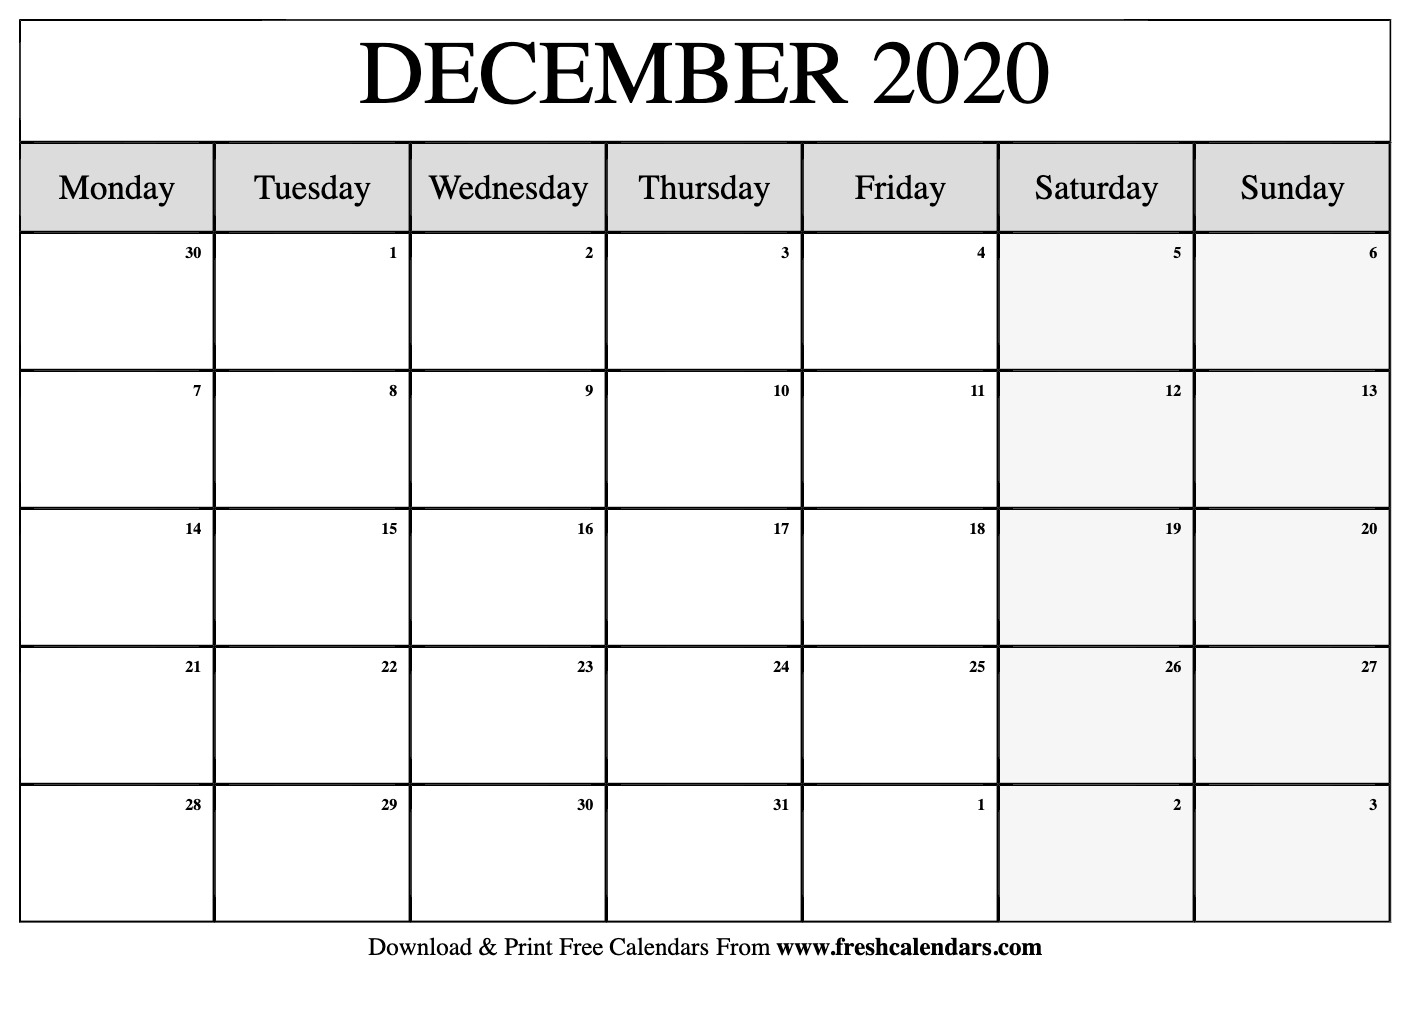 Free Printable December 2020 Calendar throughout Printable 2020 Calendar Starting Monday